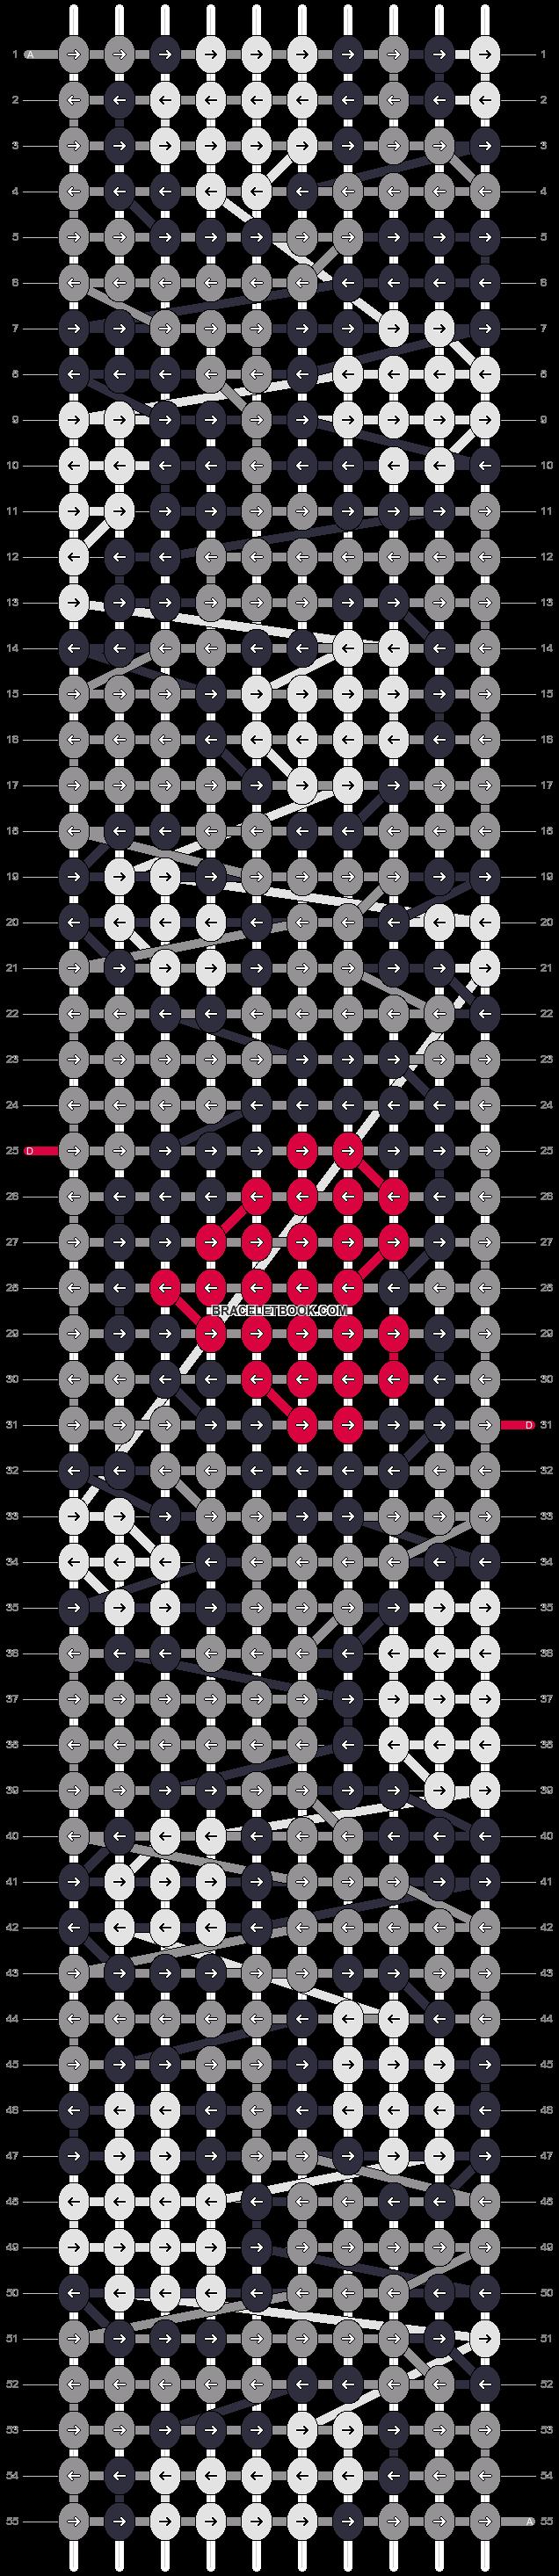 Alpha pattern #17852 pattern